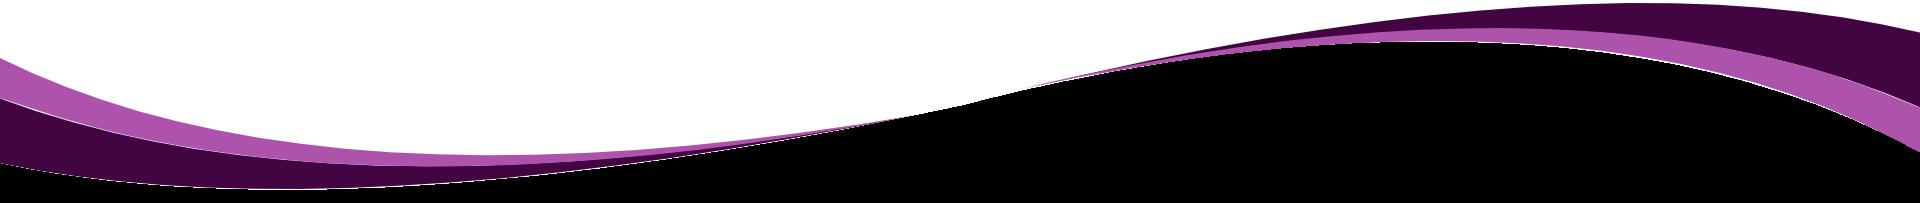 purple swoosh down up white above transparent below